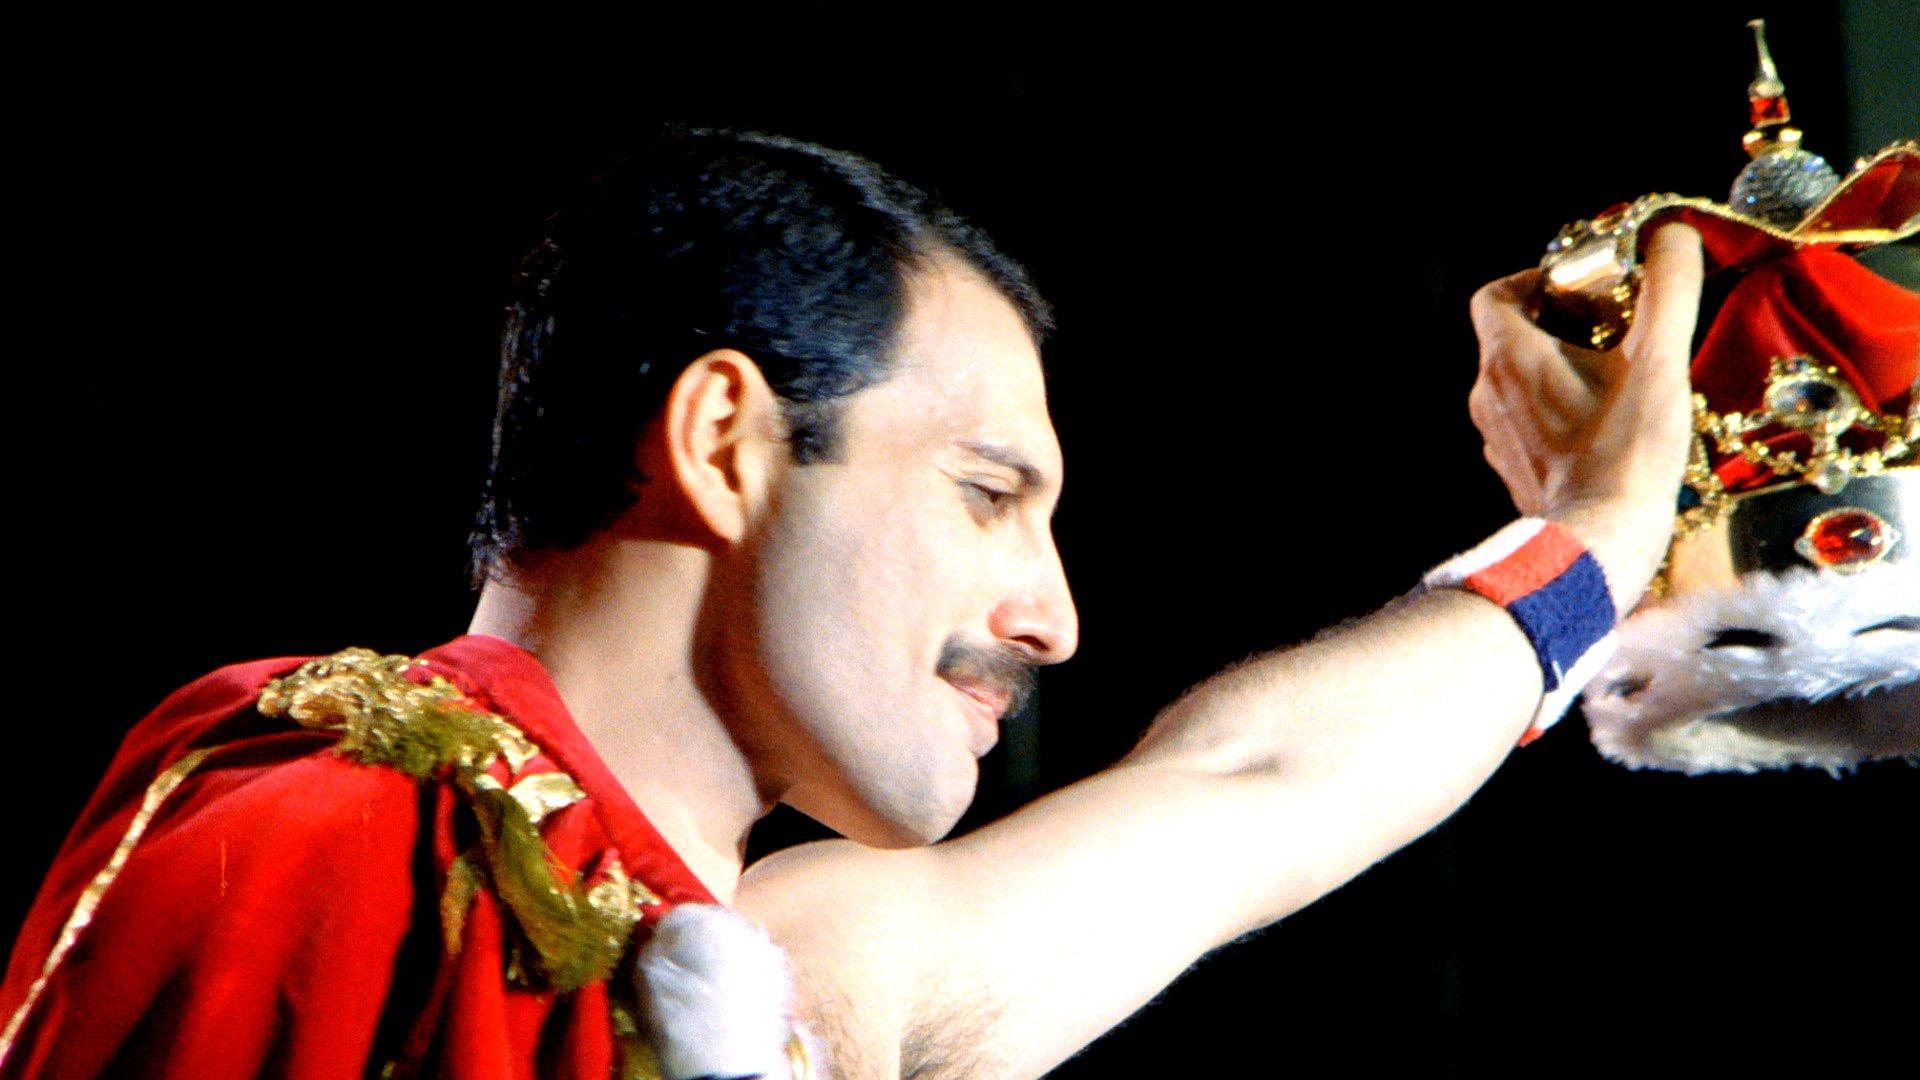 Nasceva oggi, 70 anni fa, Freddie Mercury - FAREMUSIC